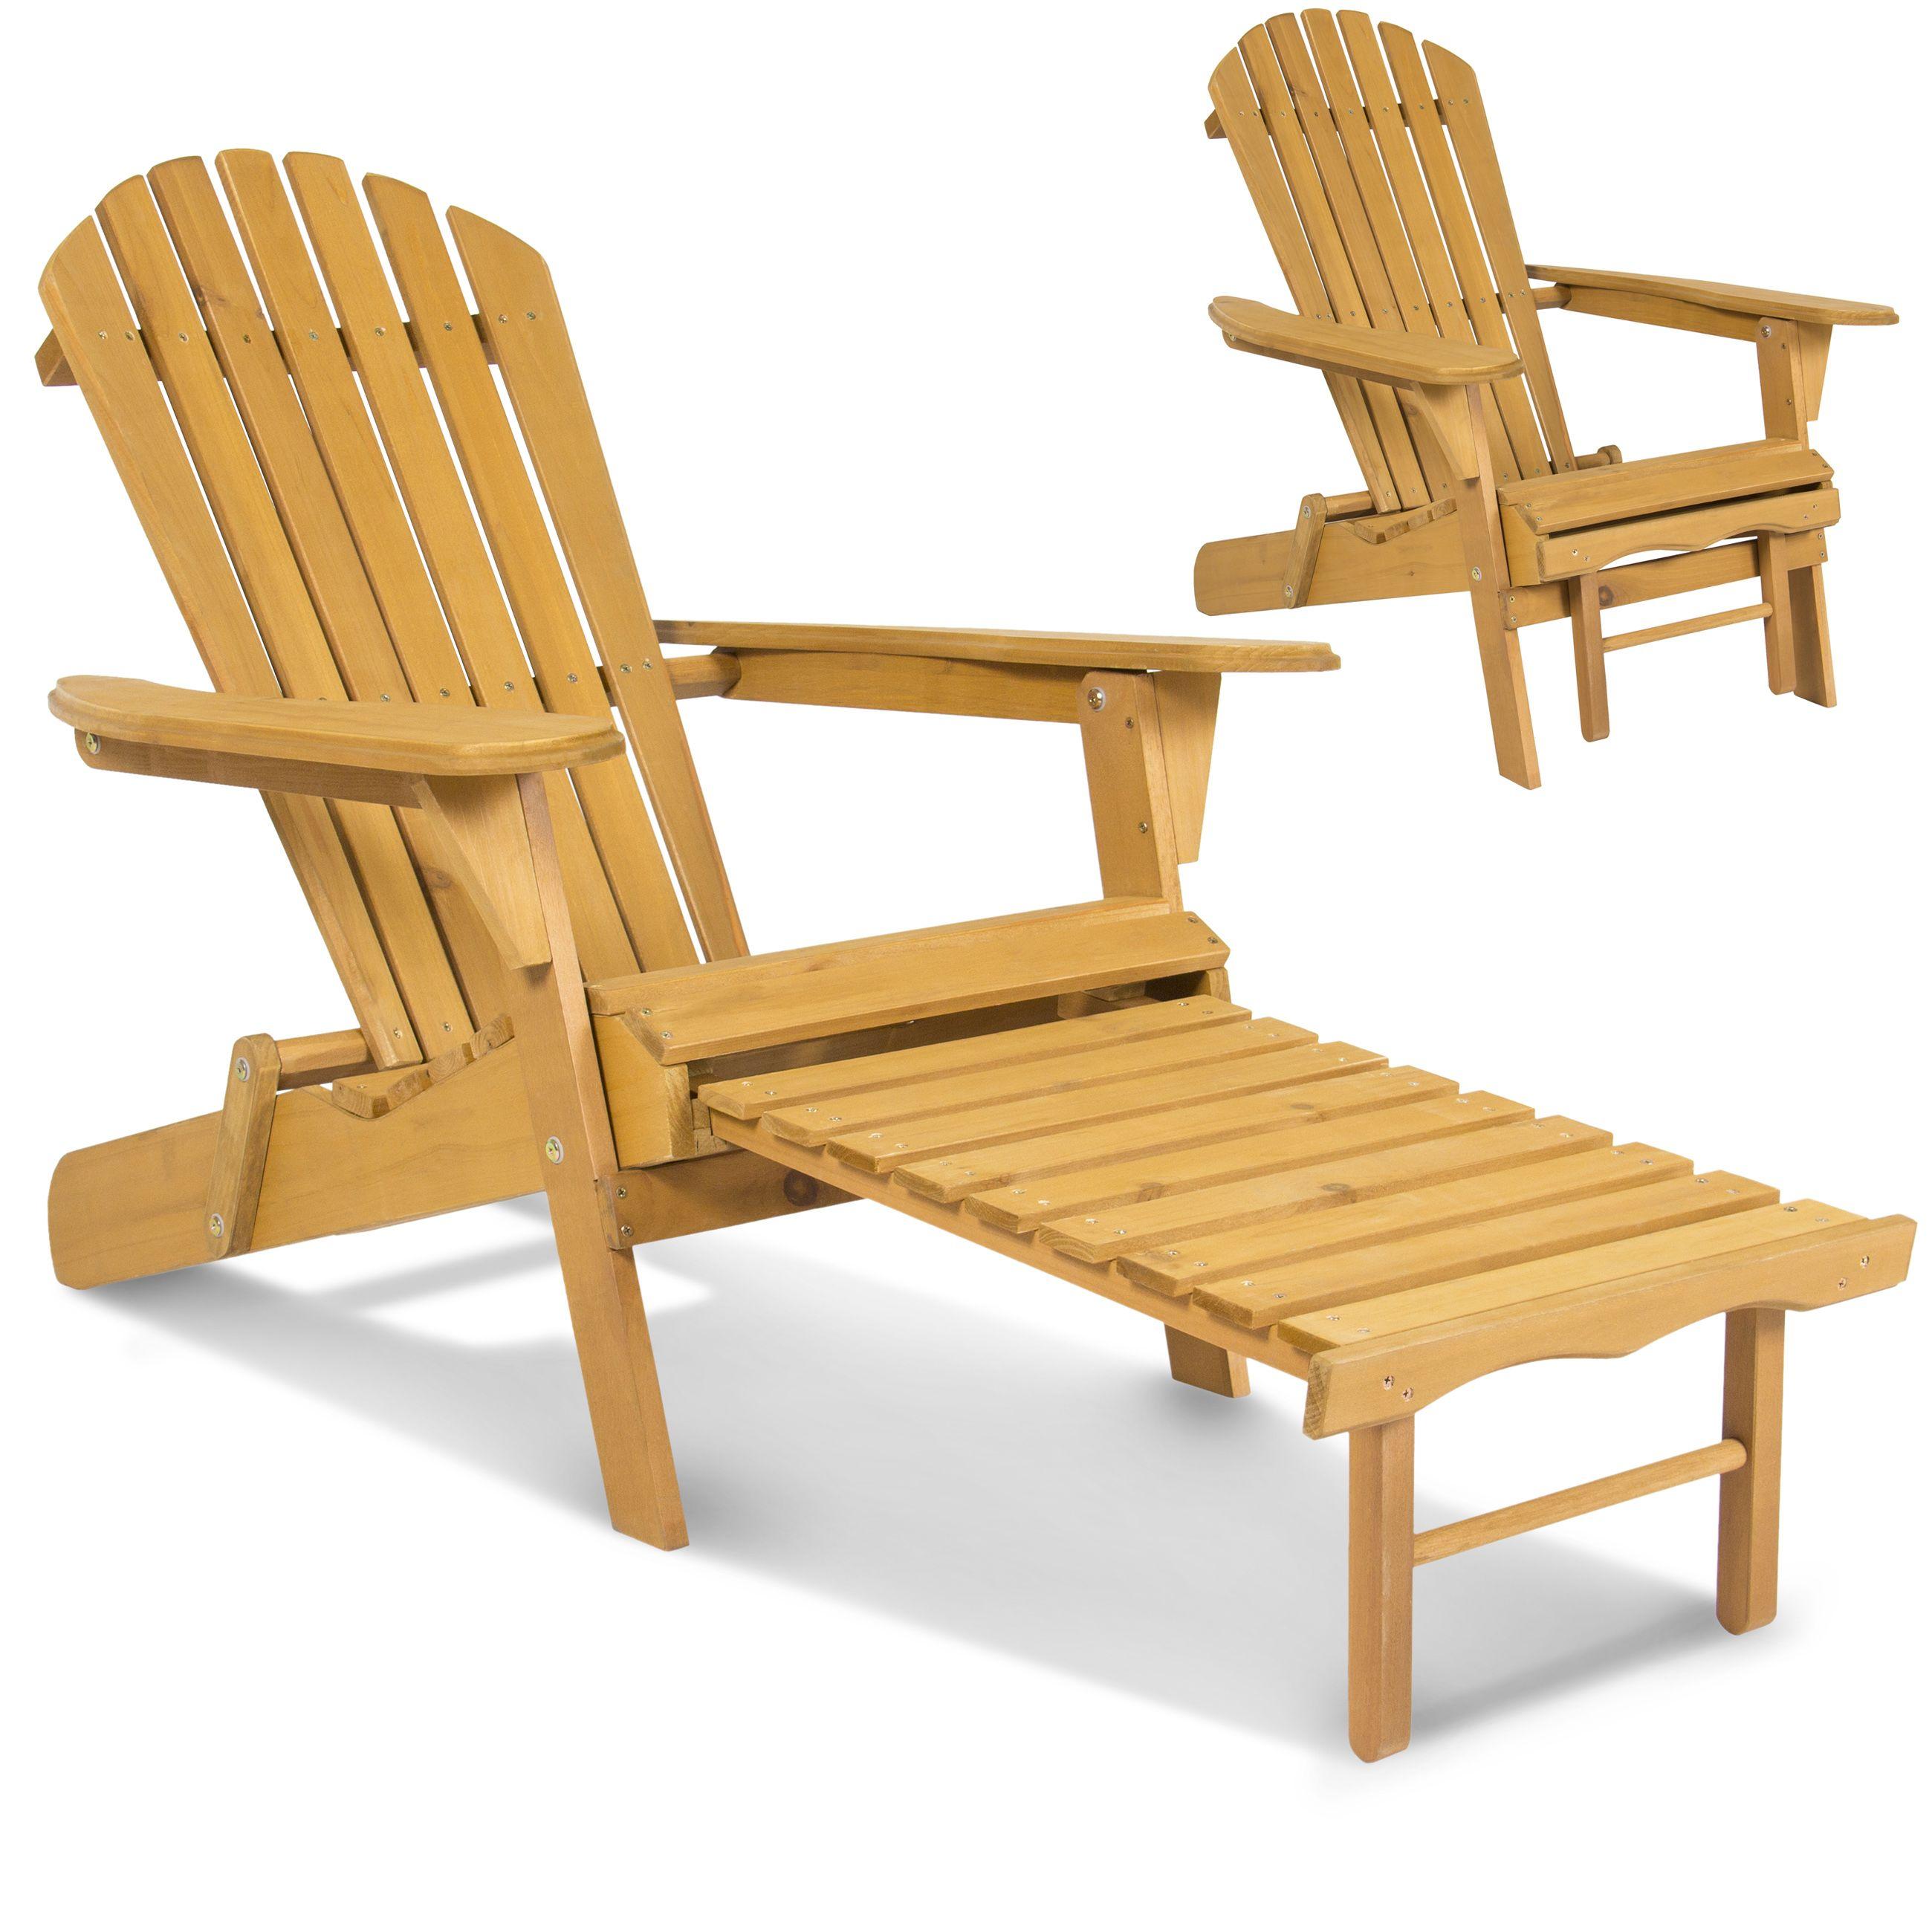 Gunstige Klapp Stuhle Billige Klapptische Gebraucht Klapptische